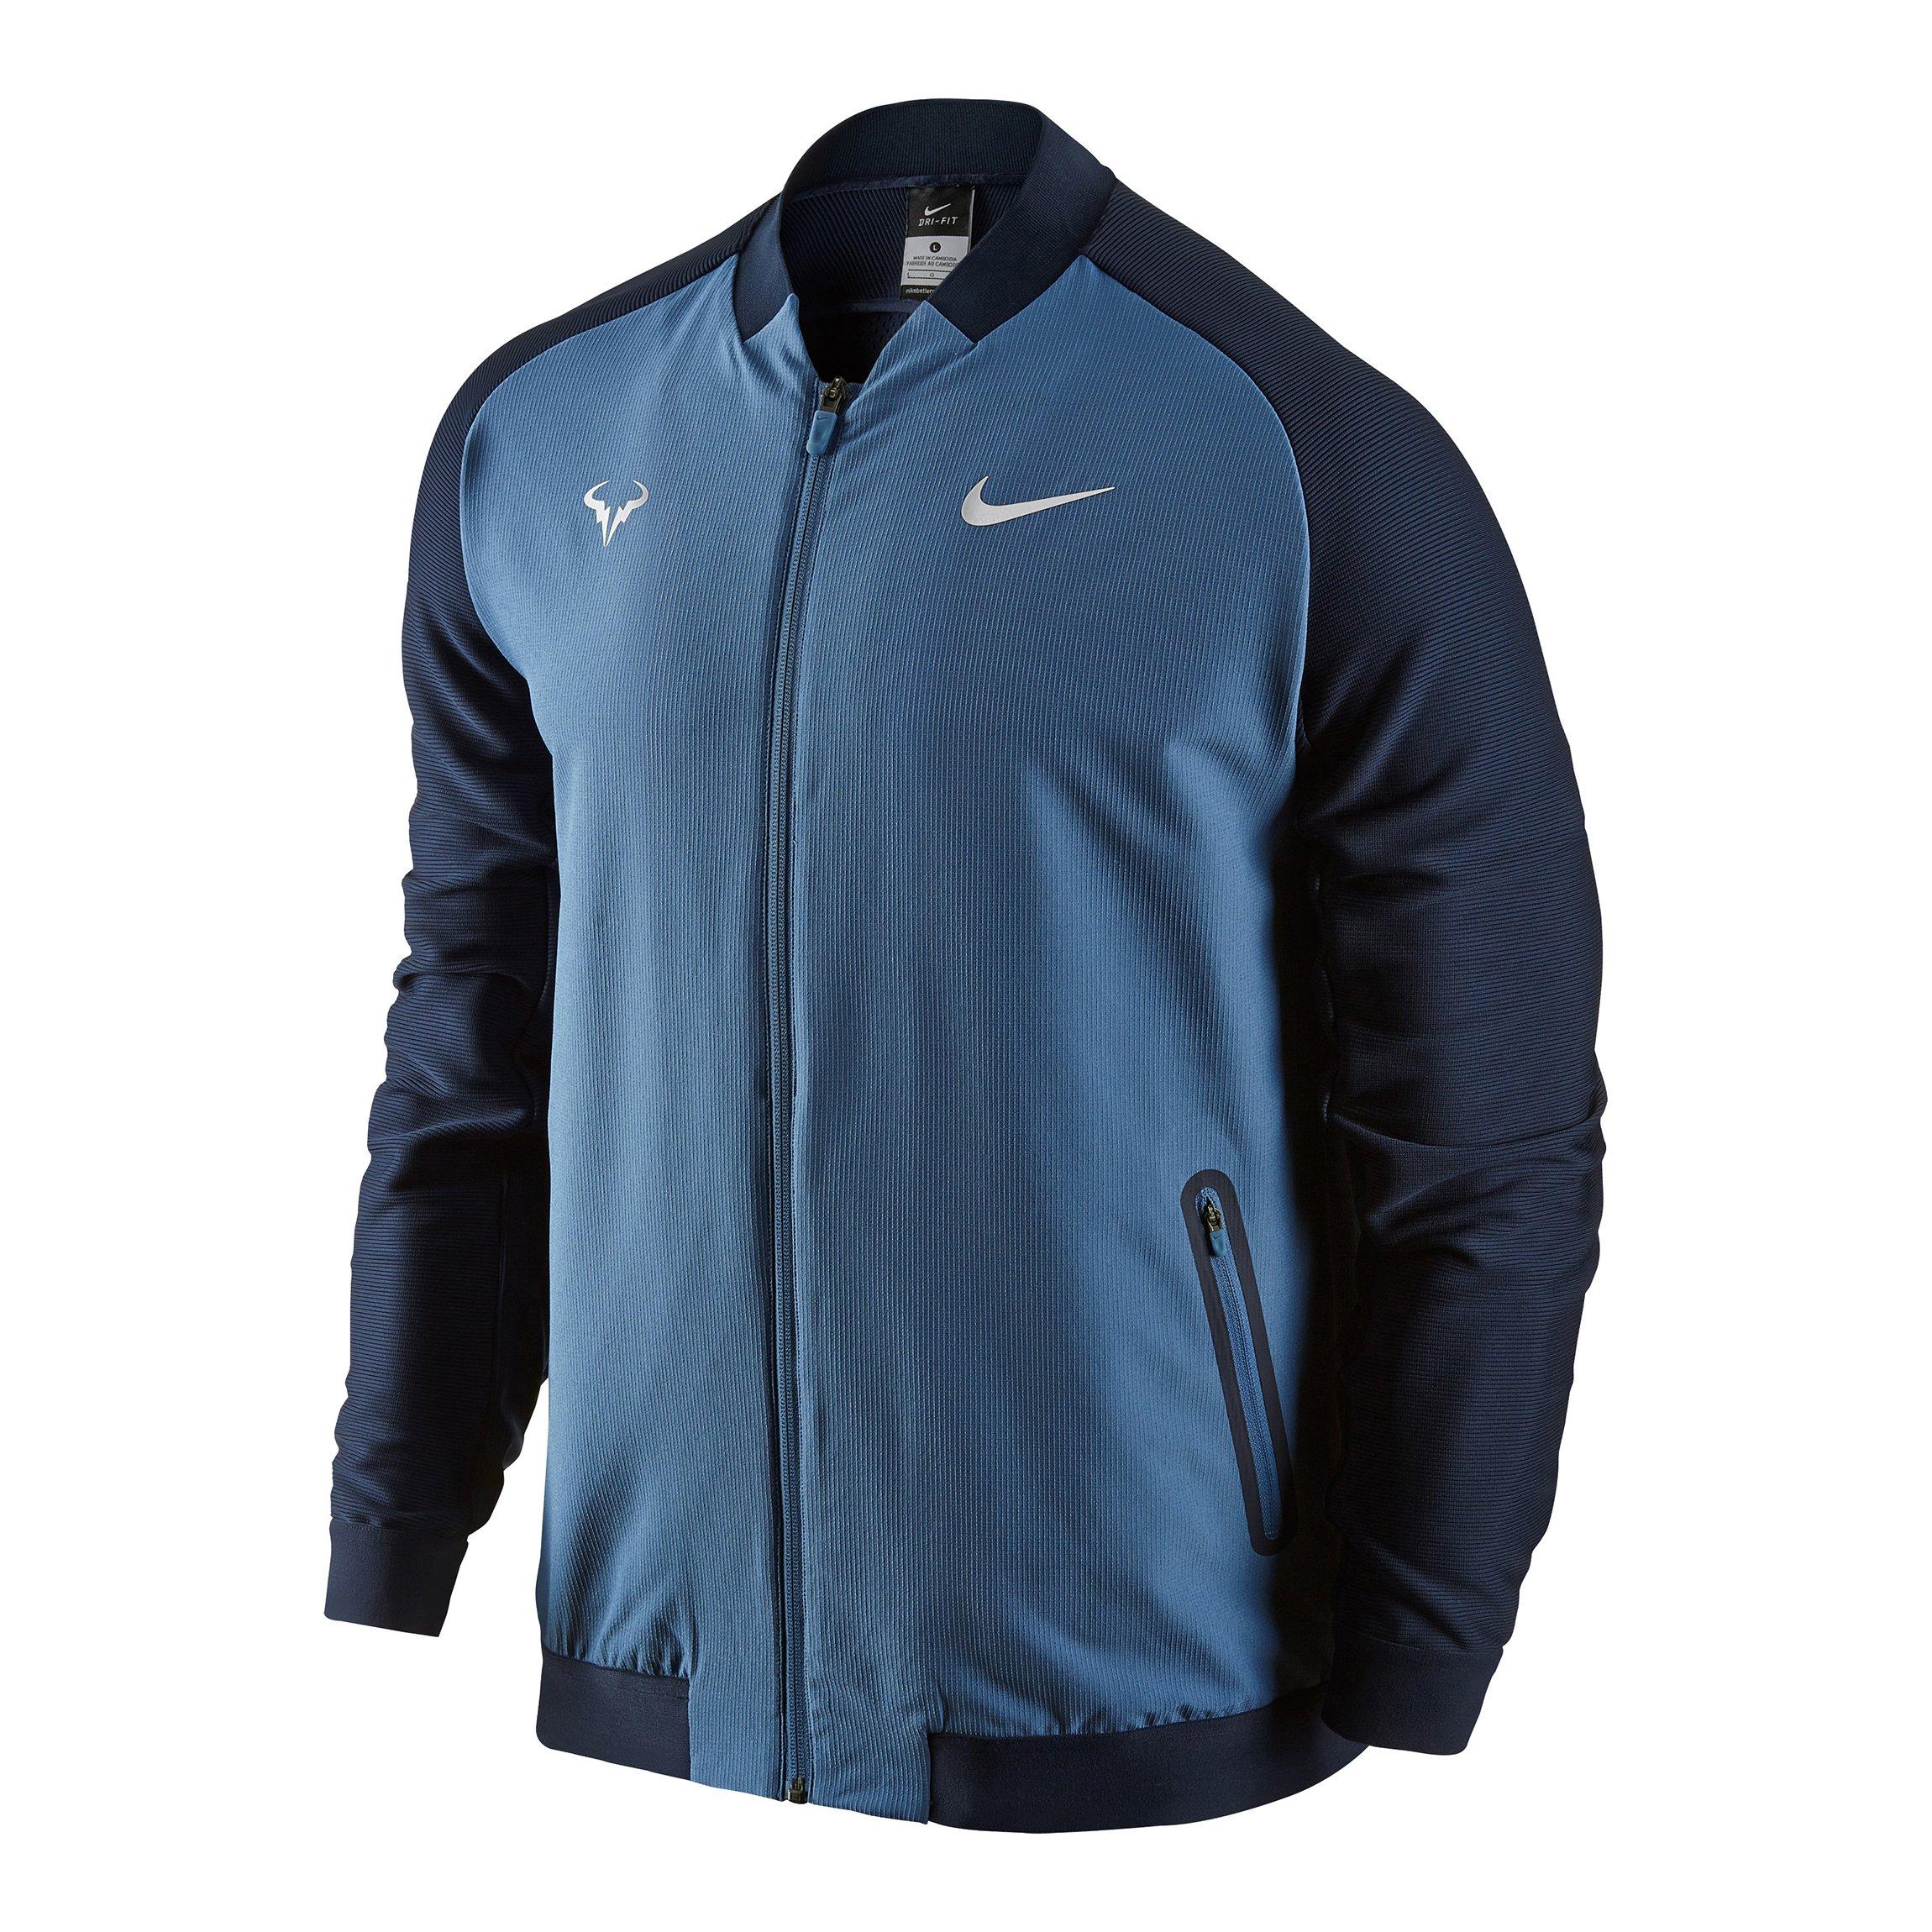 Men's Nike Premier Rafael Nadal Tennis Jacket Ocean Blue 728986-404 (L)